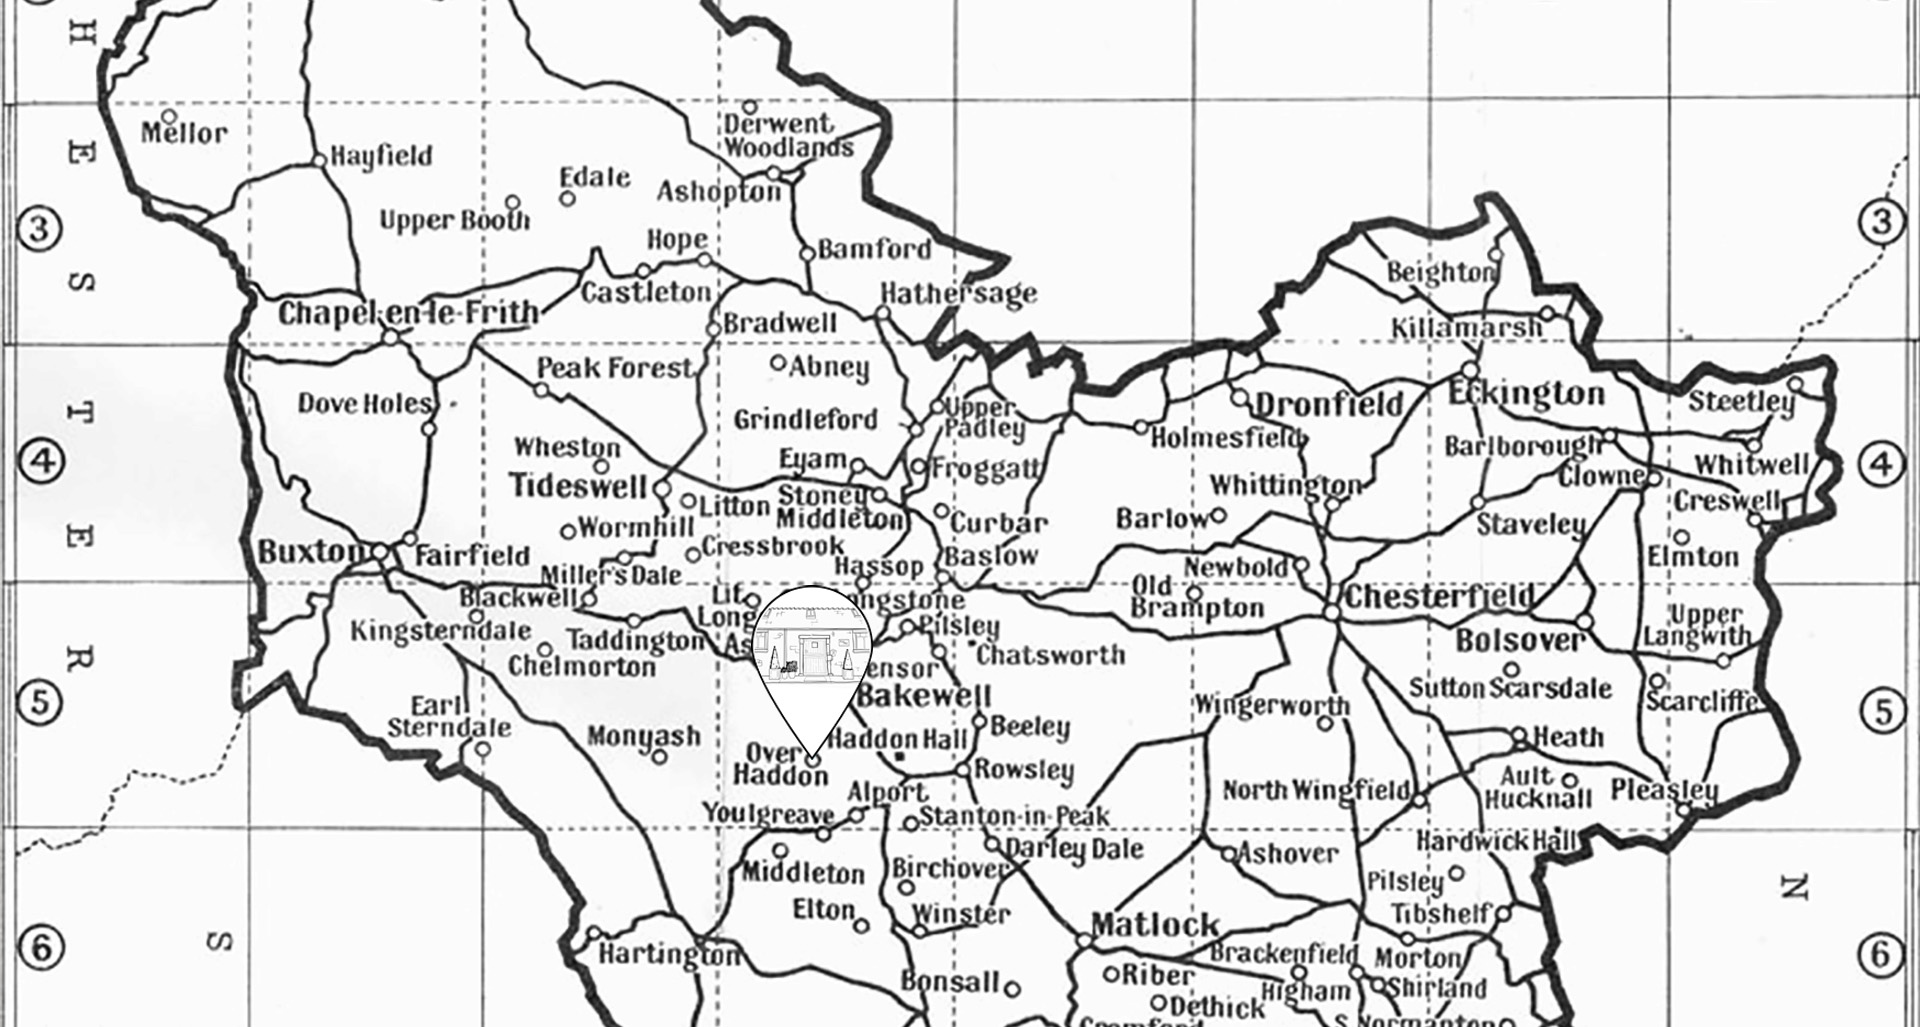 Juniper Cottage Map 2020